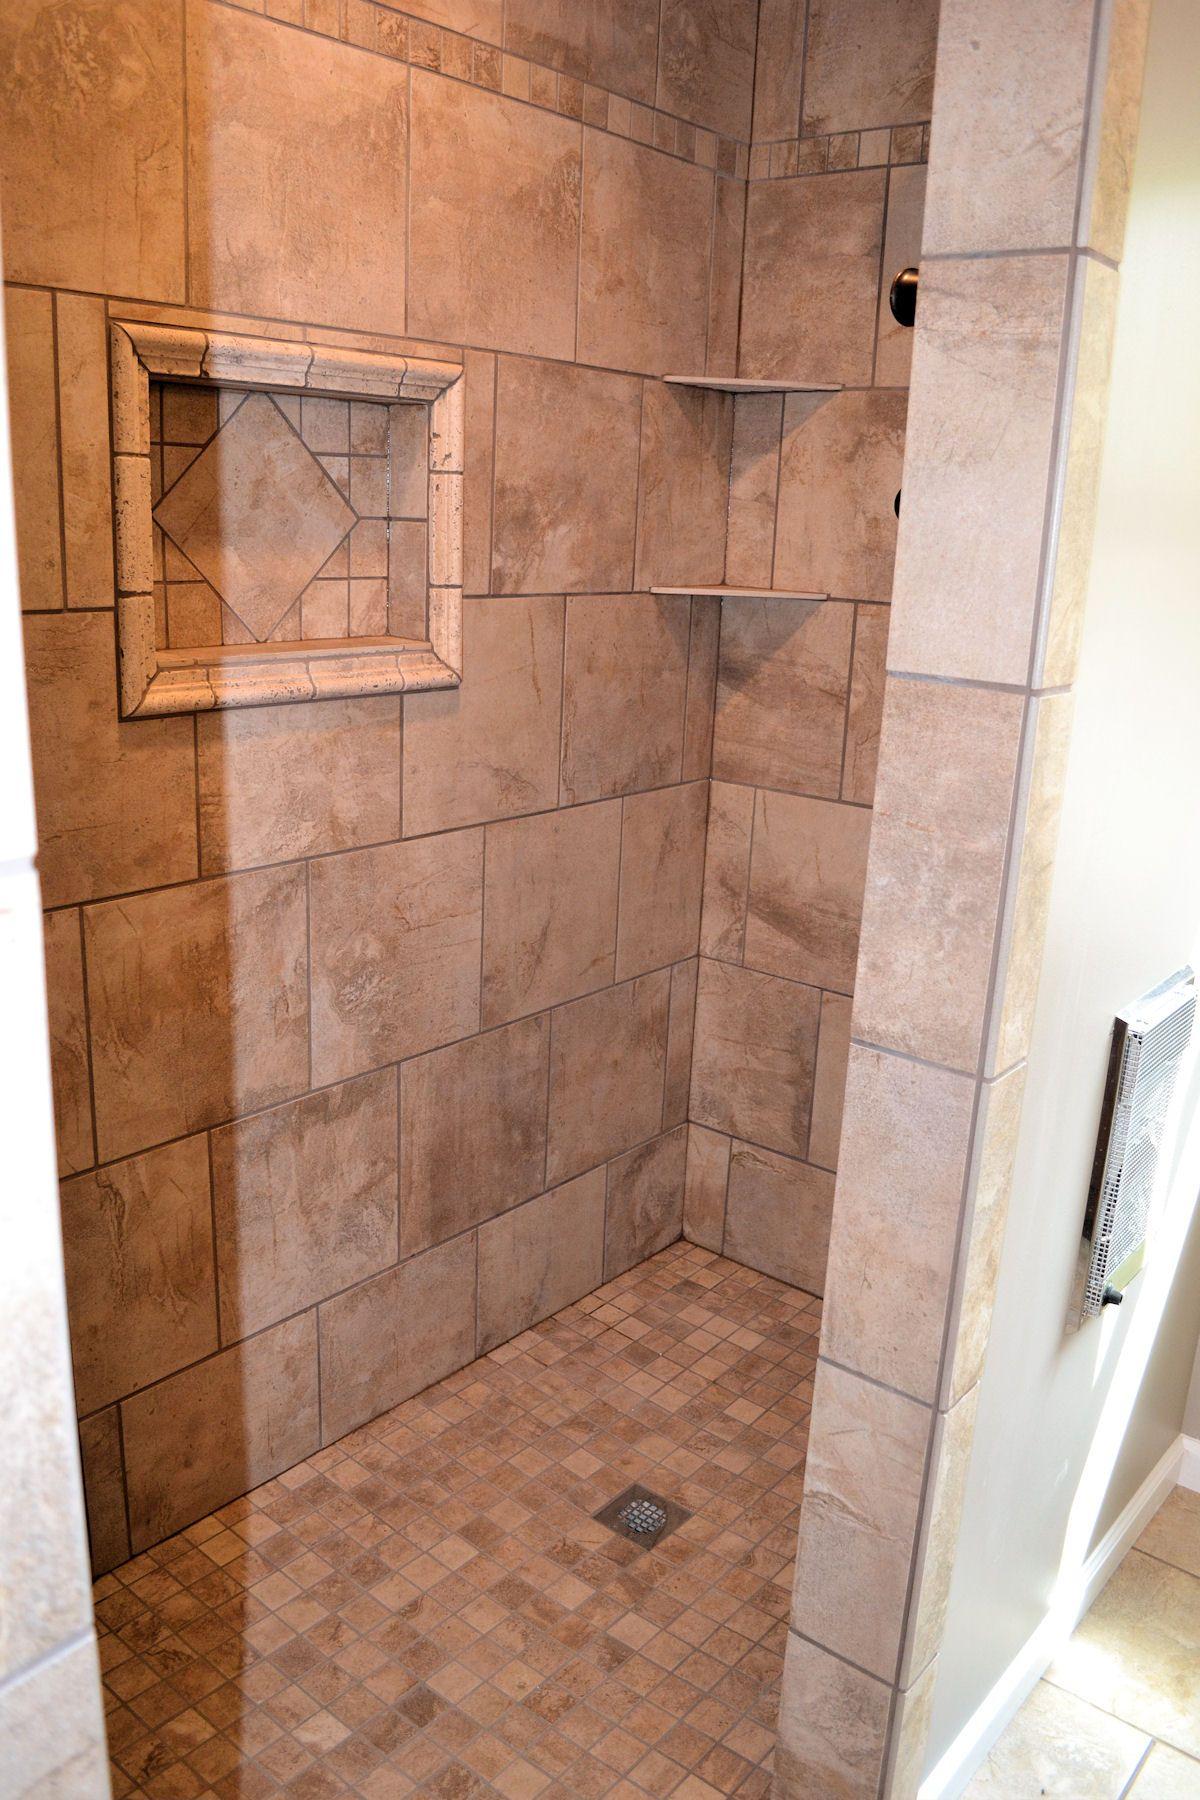 Glass shower cabin partition walls white ceramic flooring tile ...